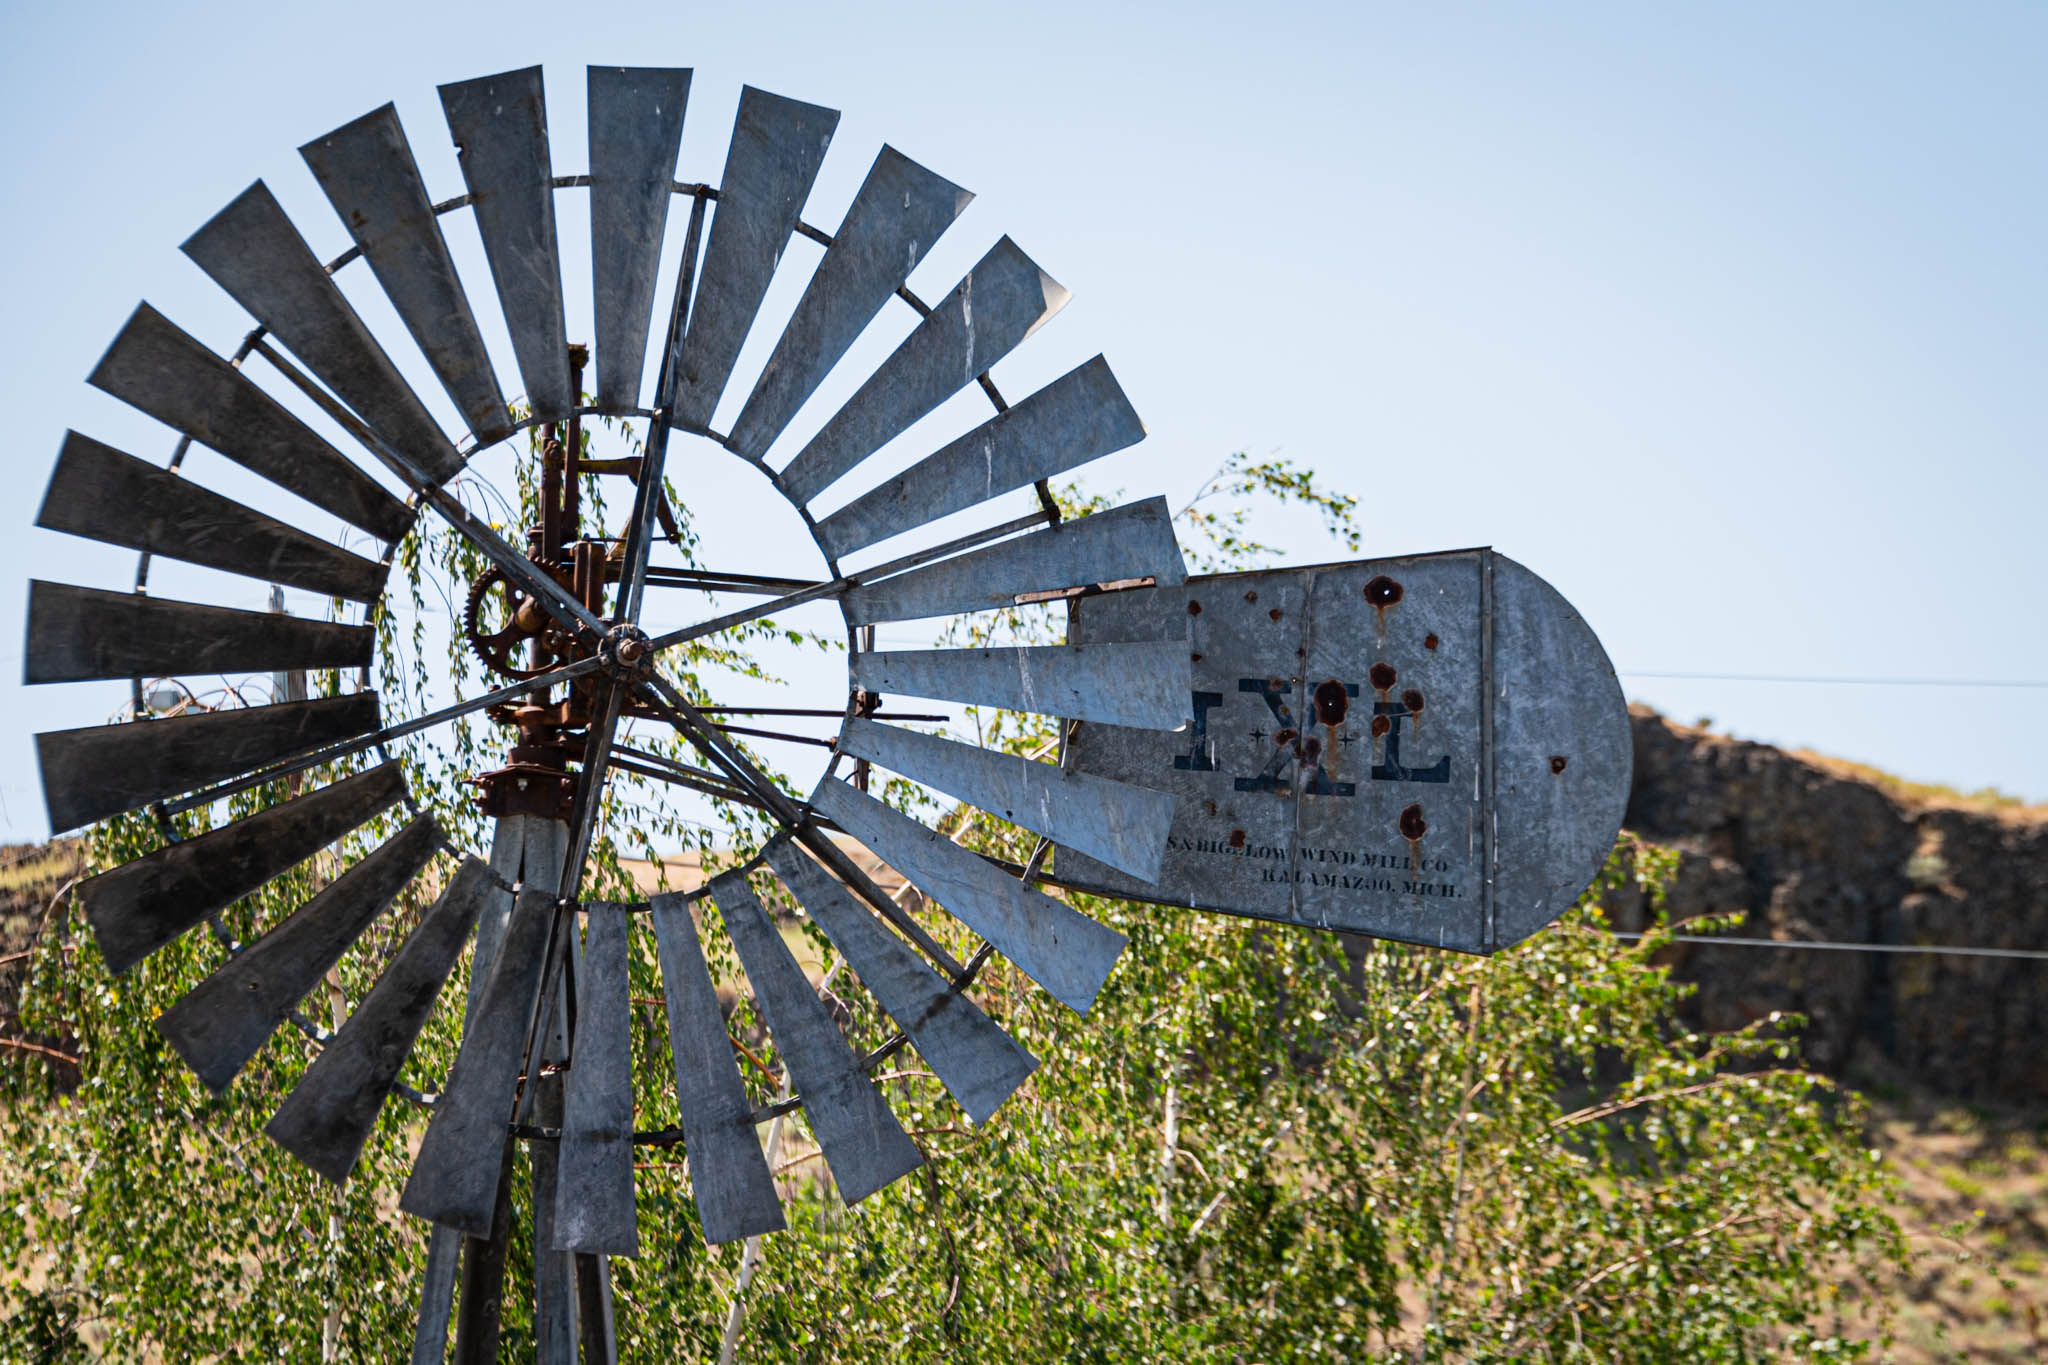 A windmill is idle in Washtucna, Washington.